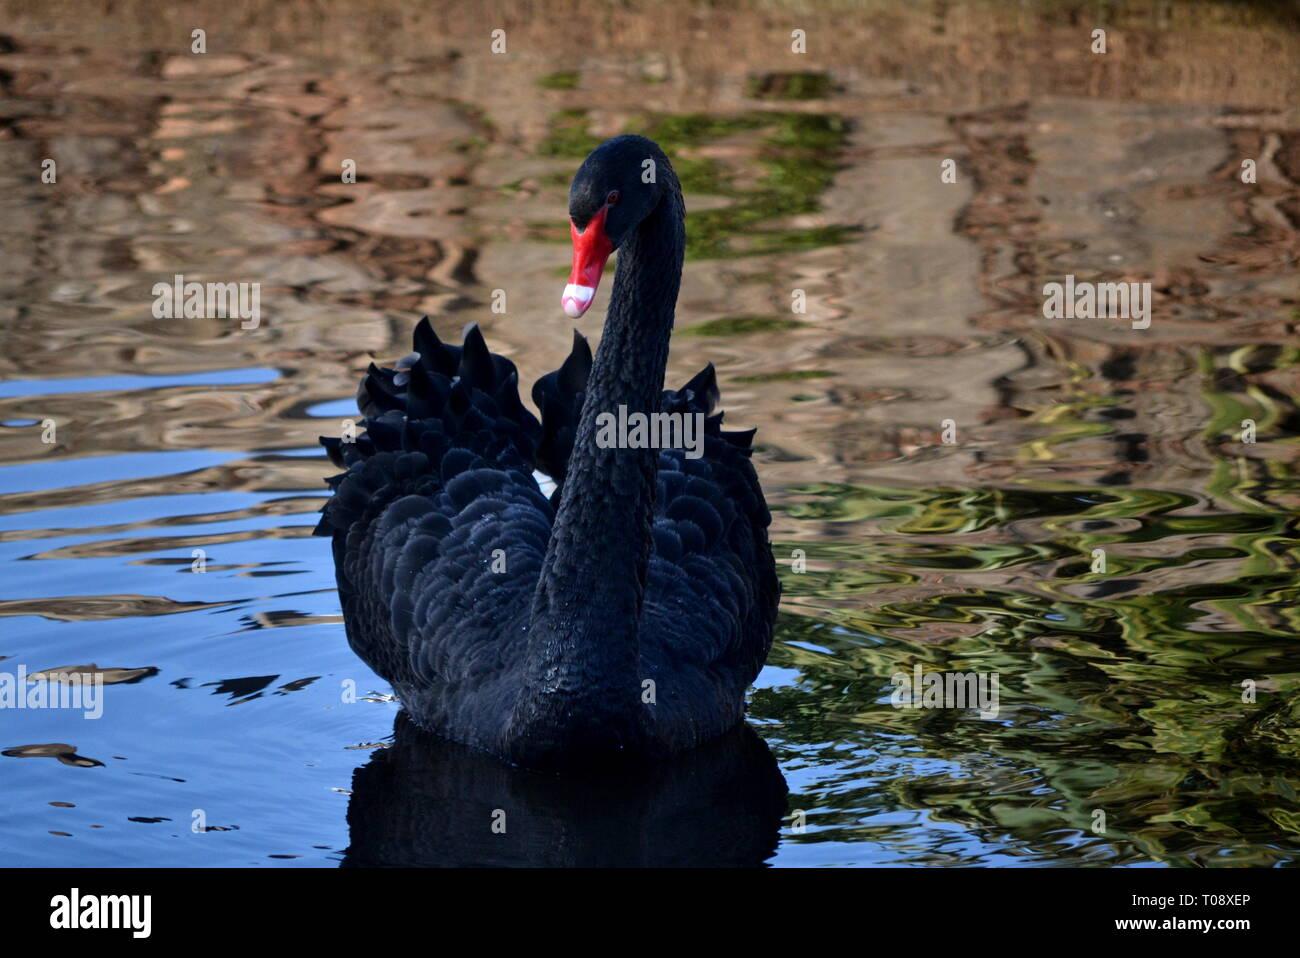 Black Swan - Stock Image